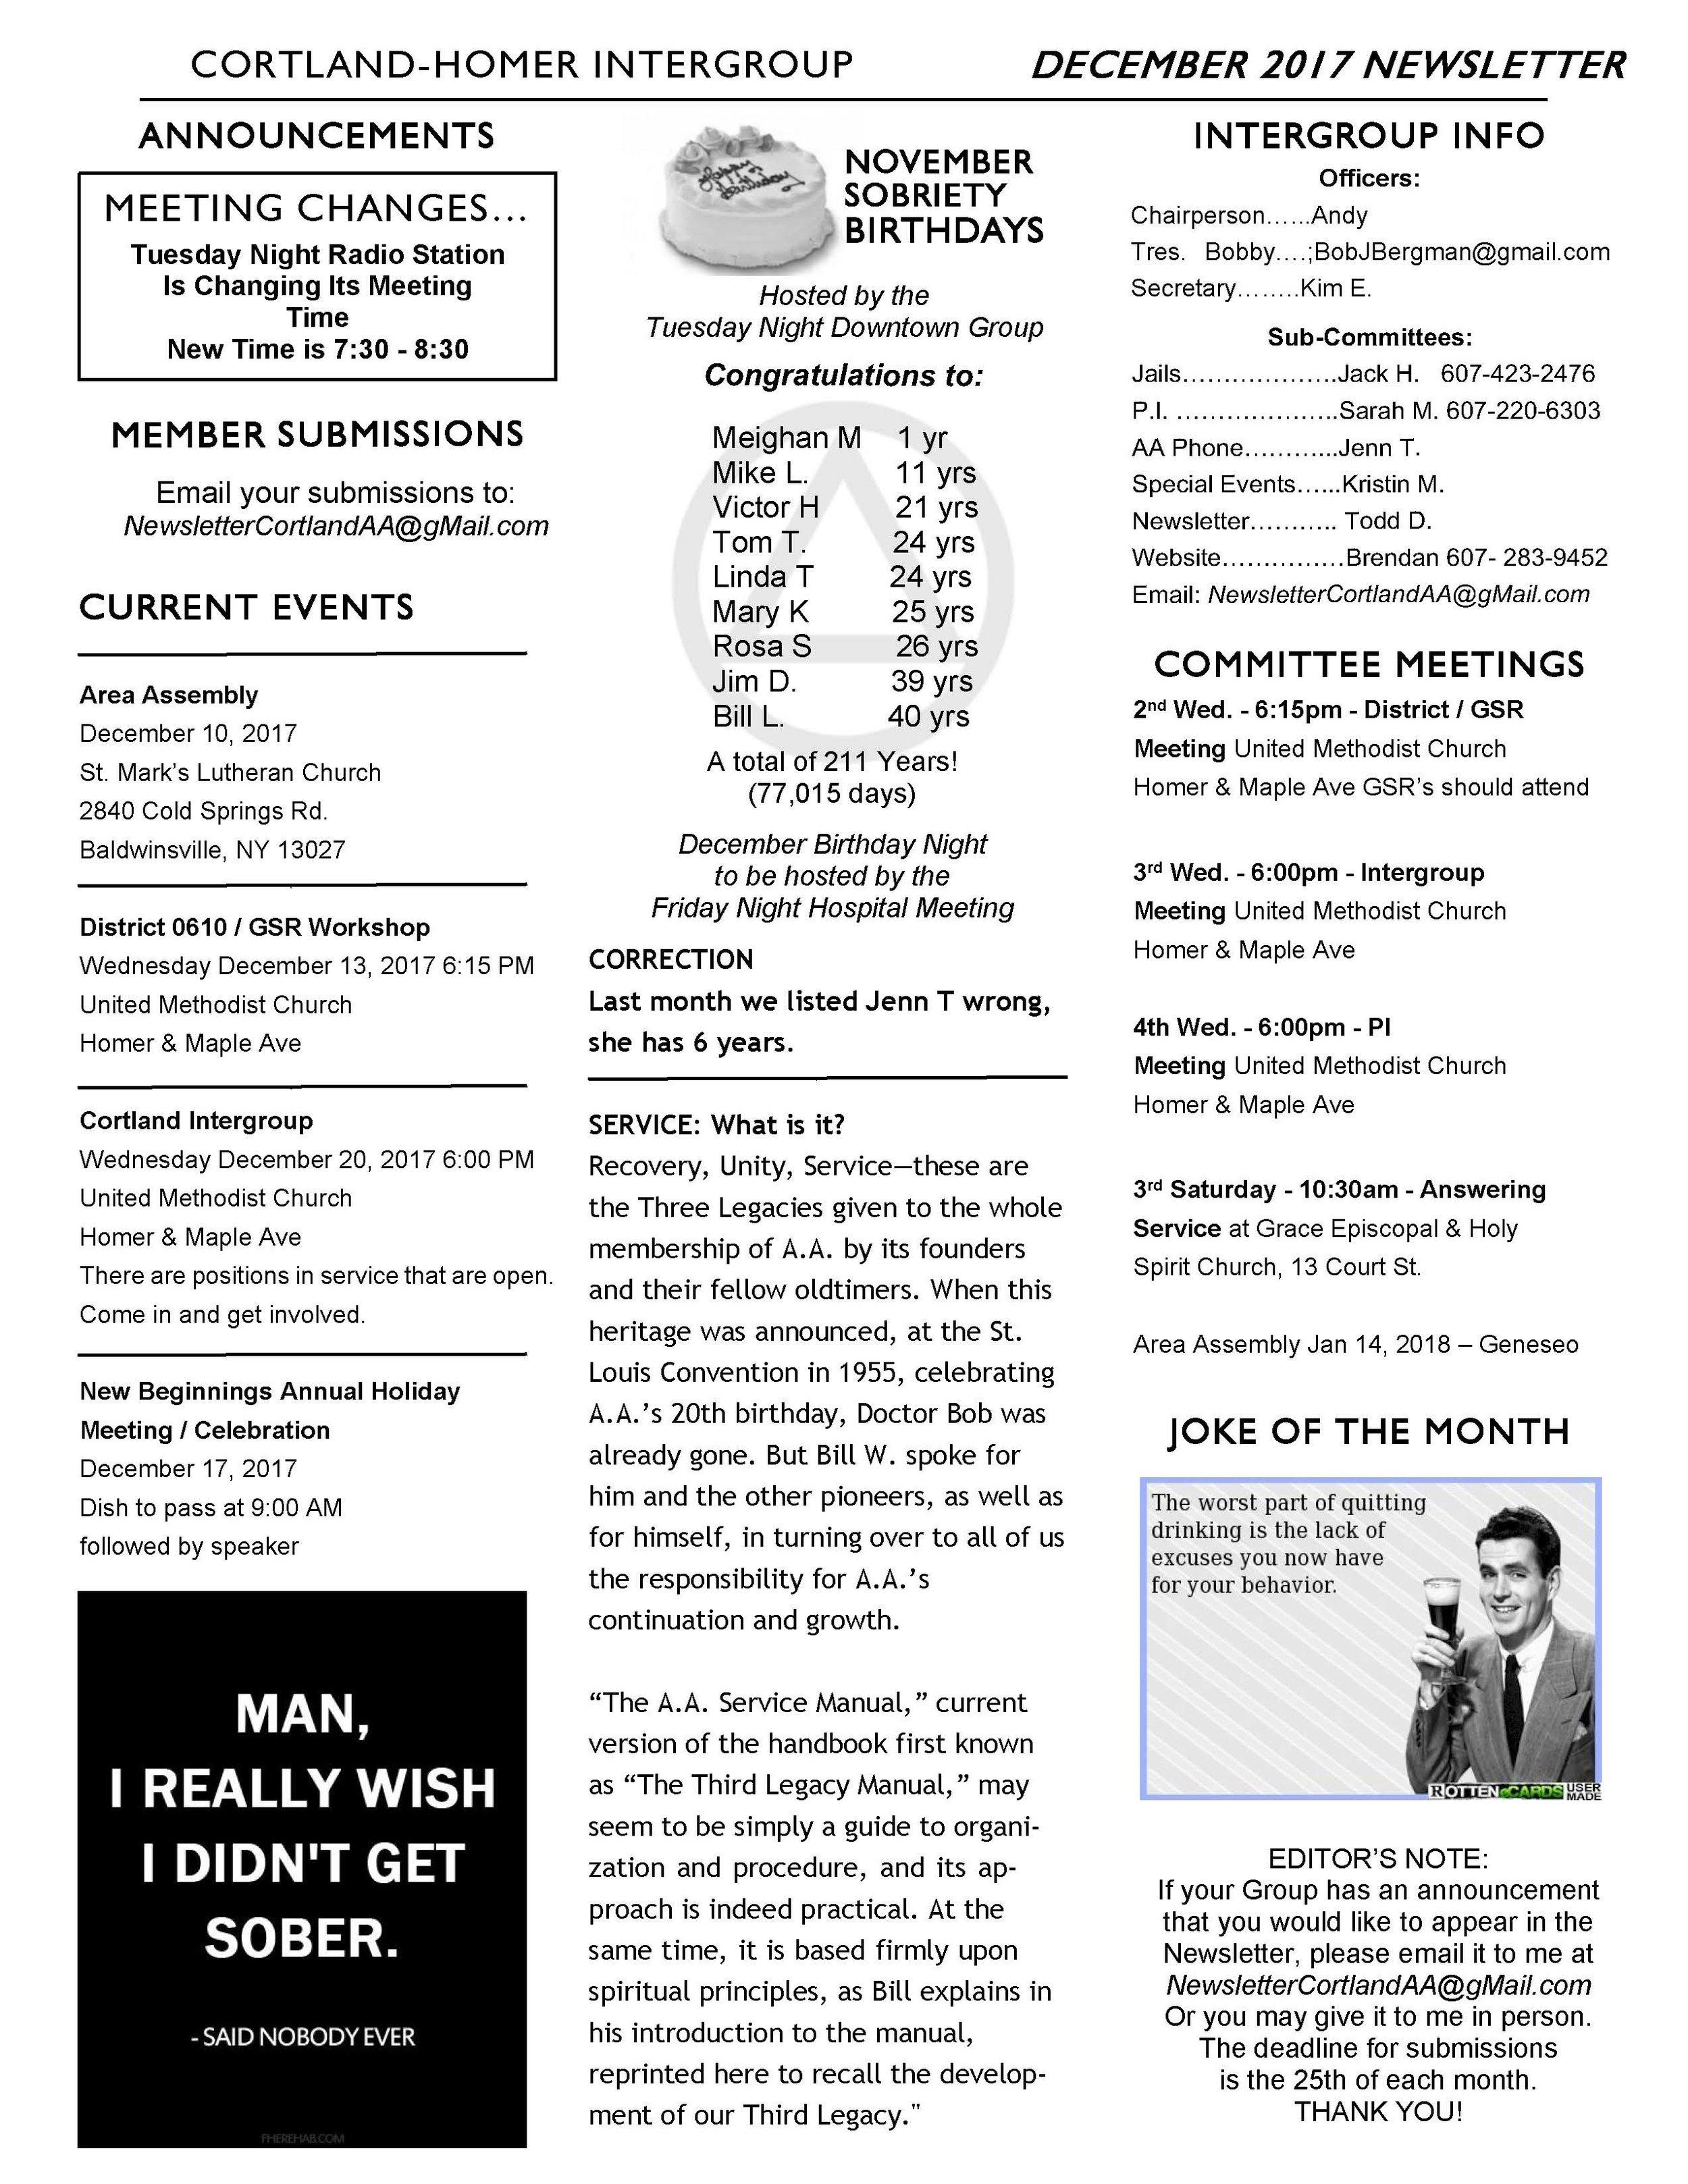 December Newsletter 2017_Page_2.jpg